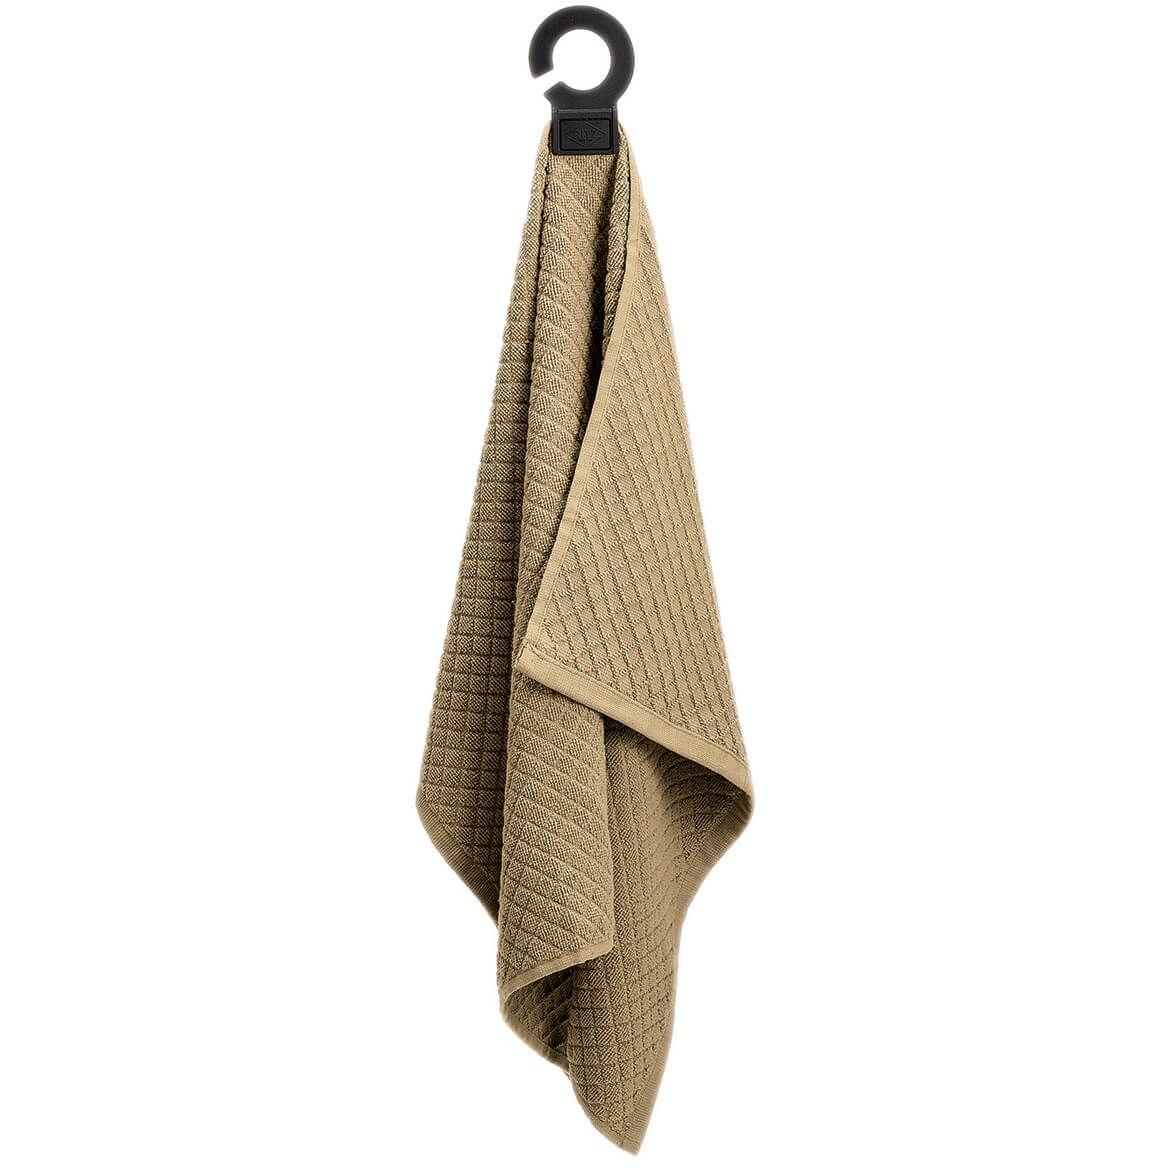 Hook and Hang Towel-368824